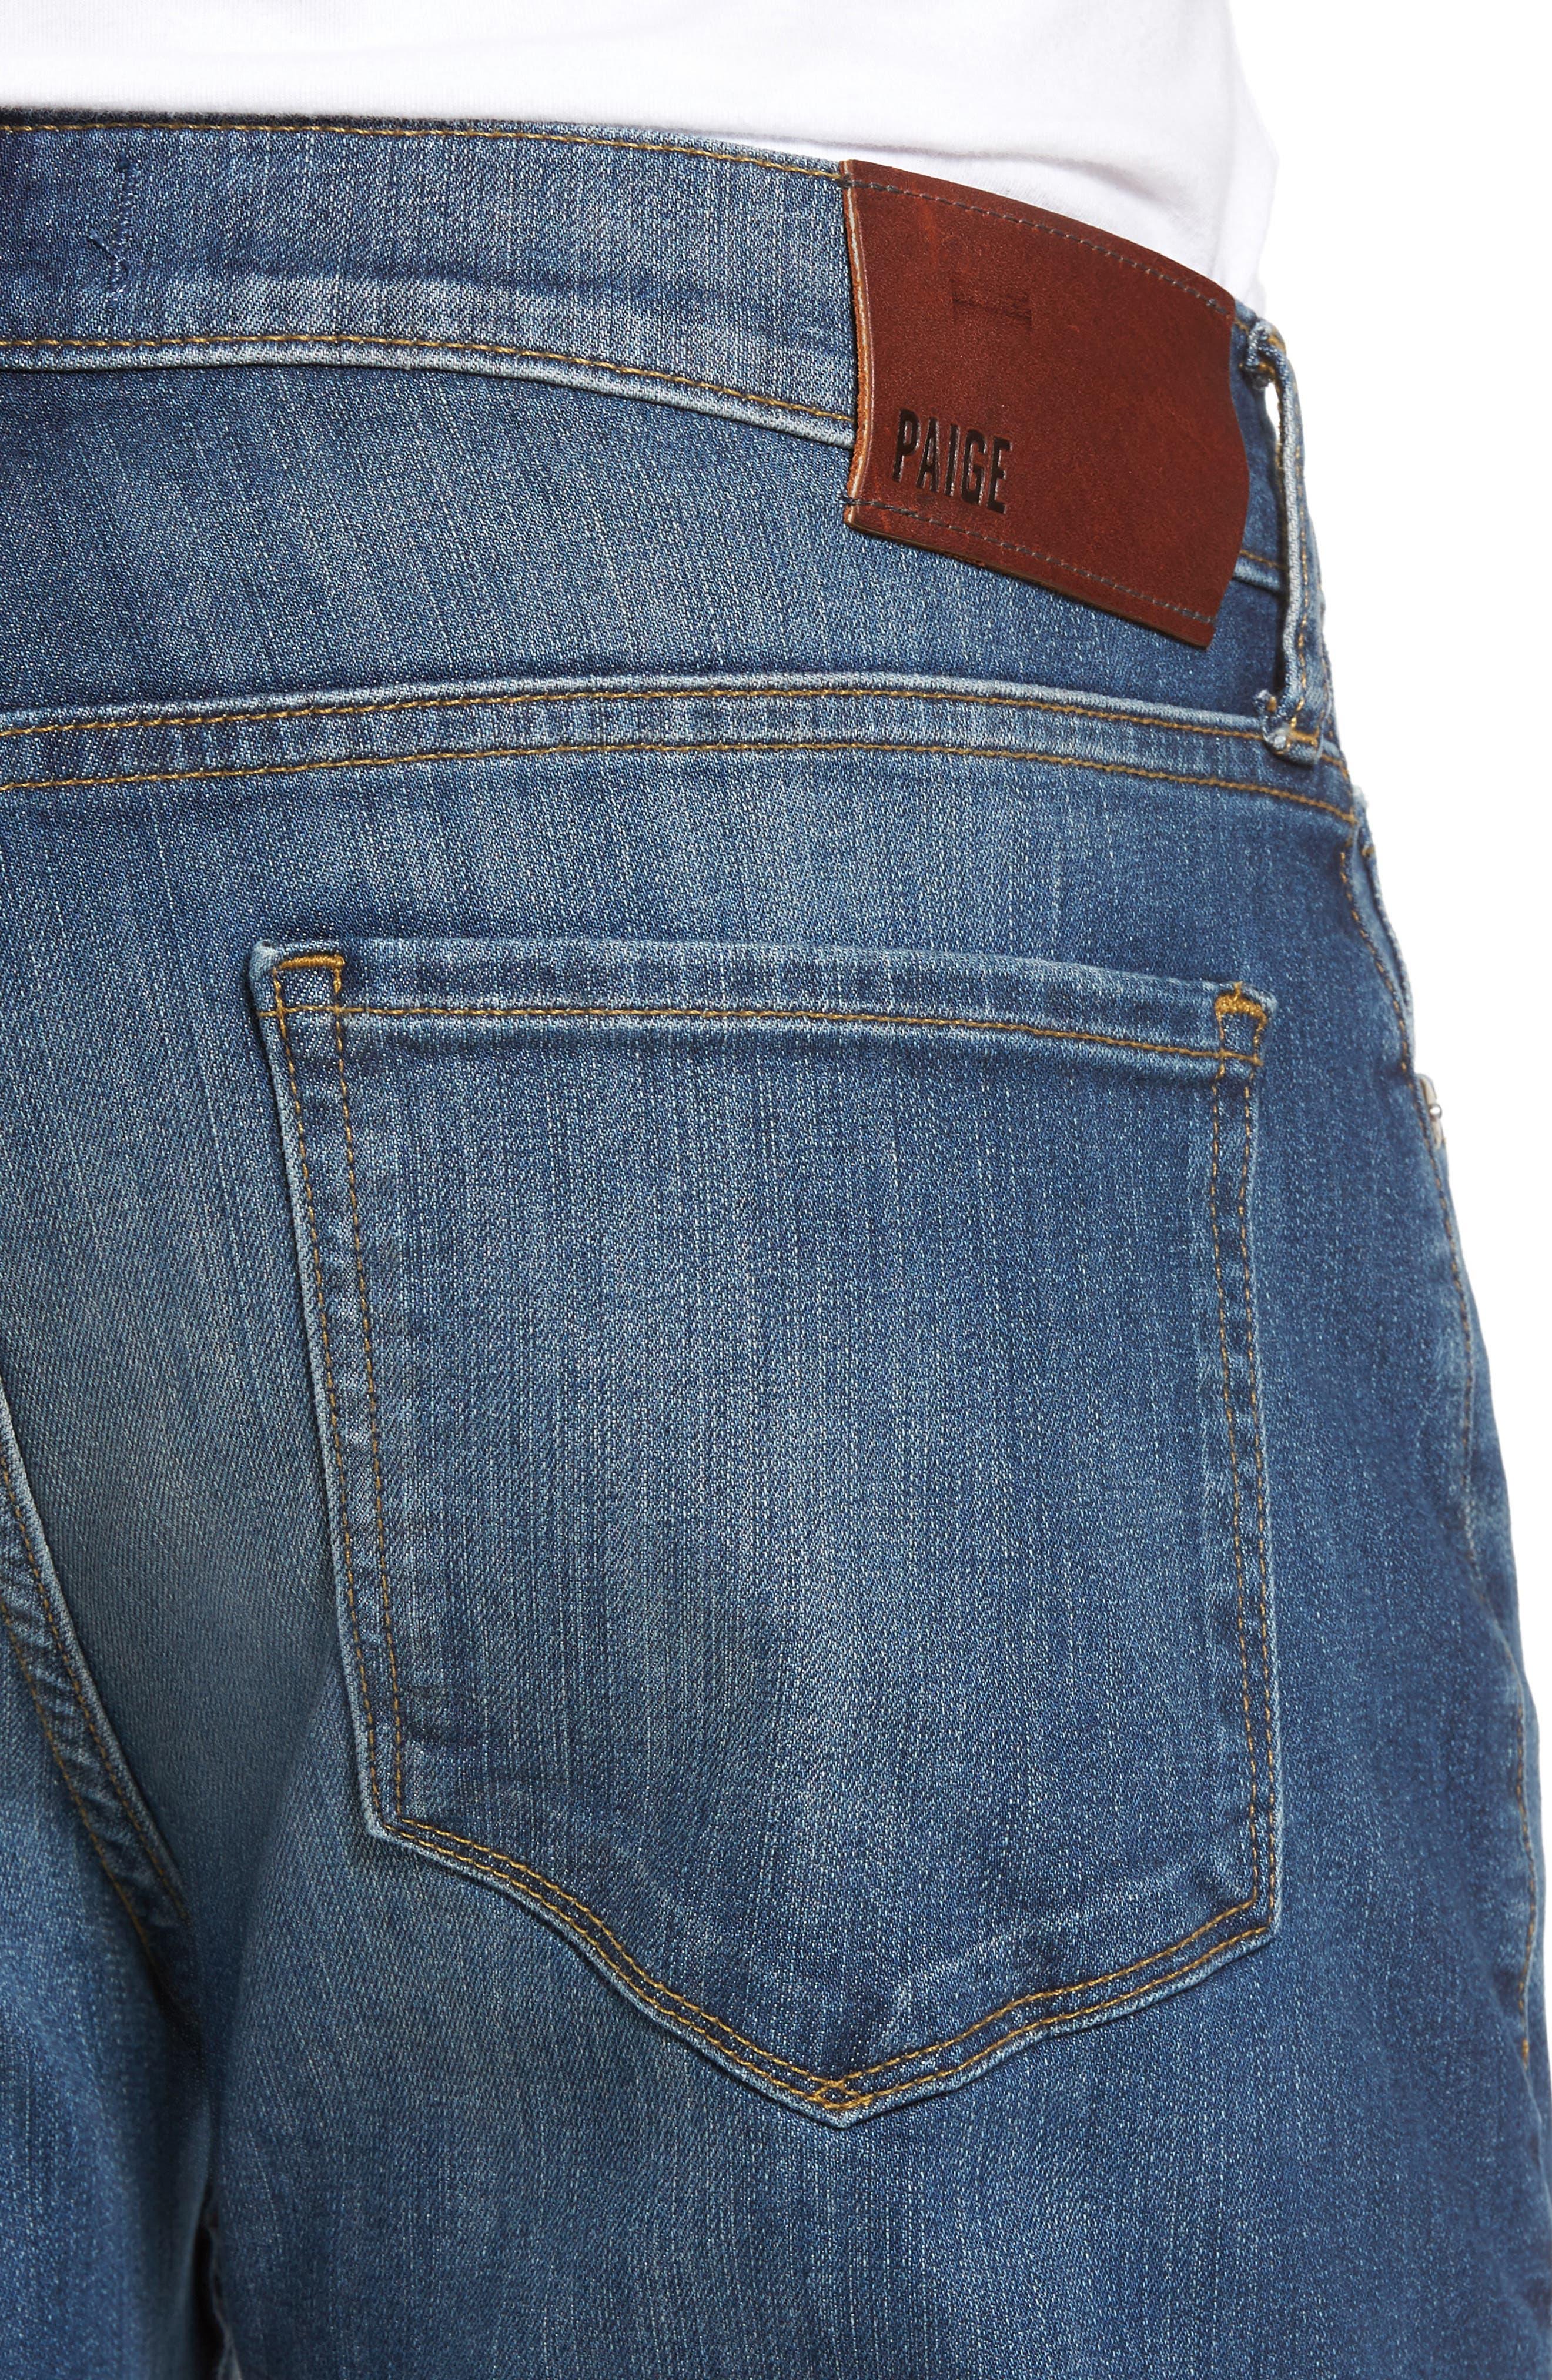 Legacy - Normandie Straight Leg Jeans,                             Alternate thumbnail 4, color,                             400